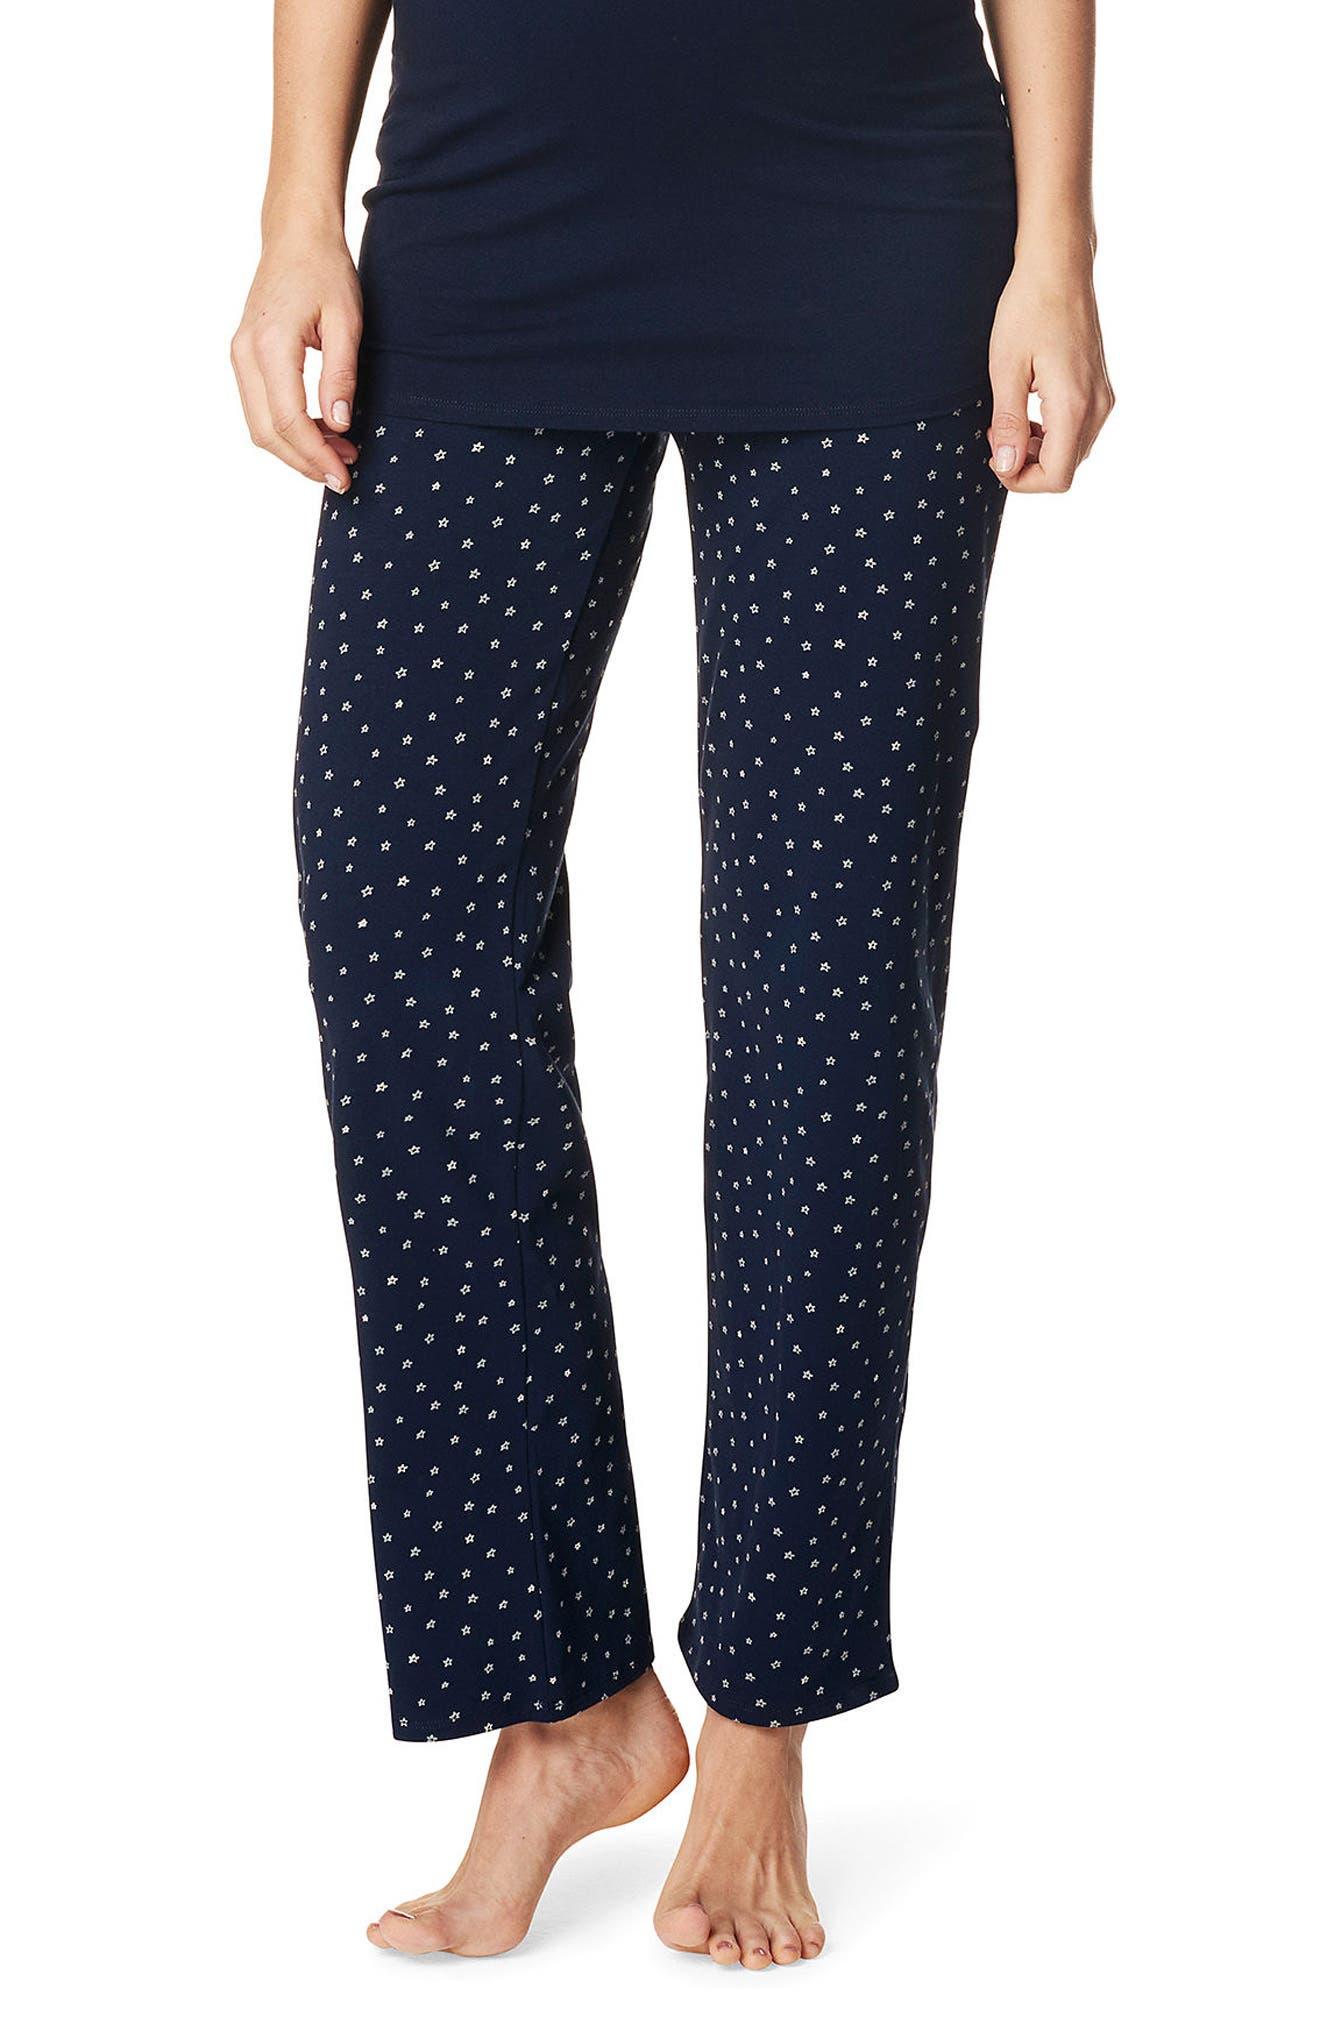 Sterre Maternity Pants,                         Main,                         color, Blue